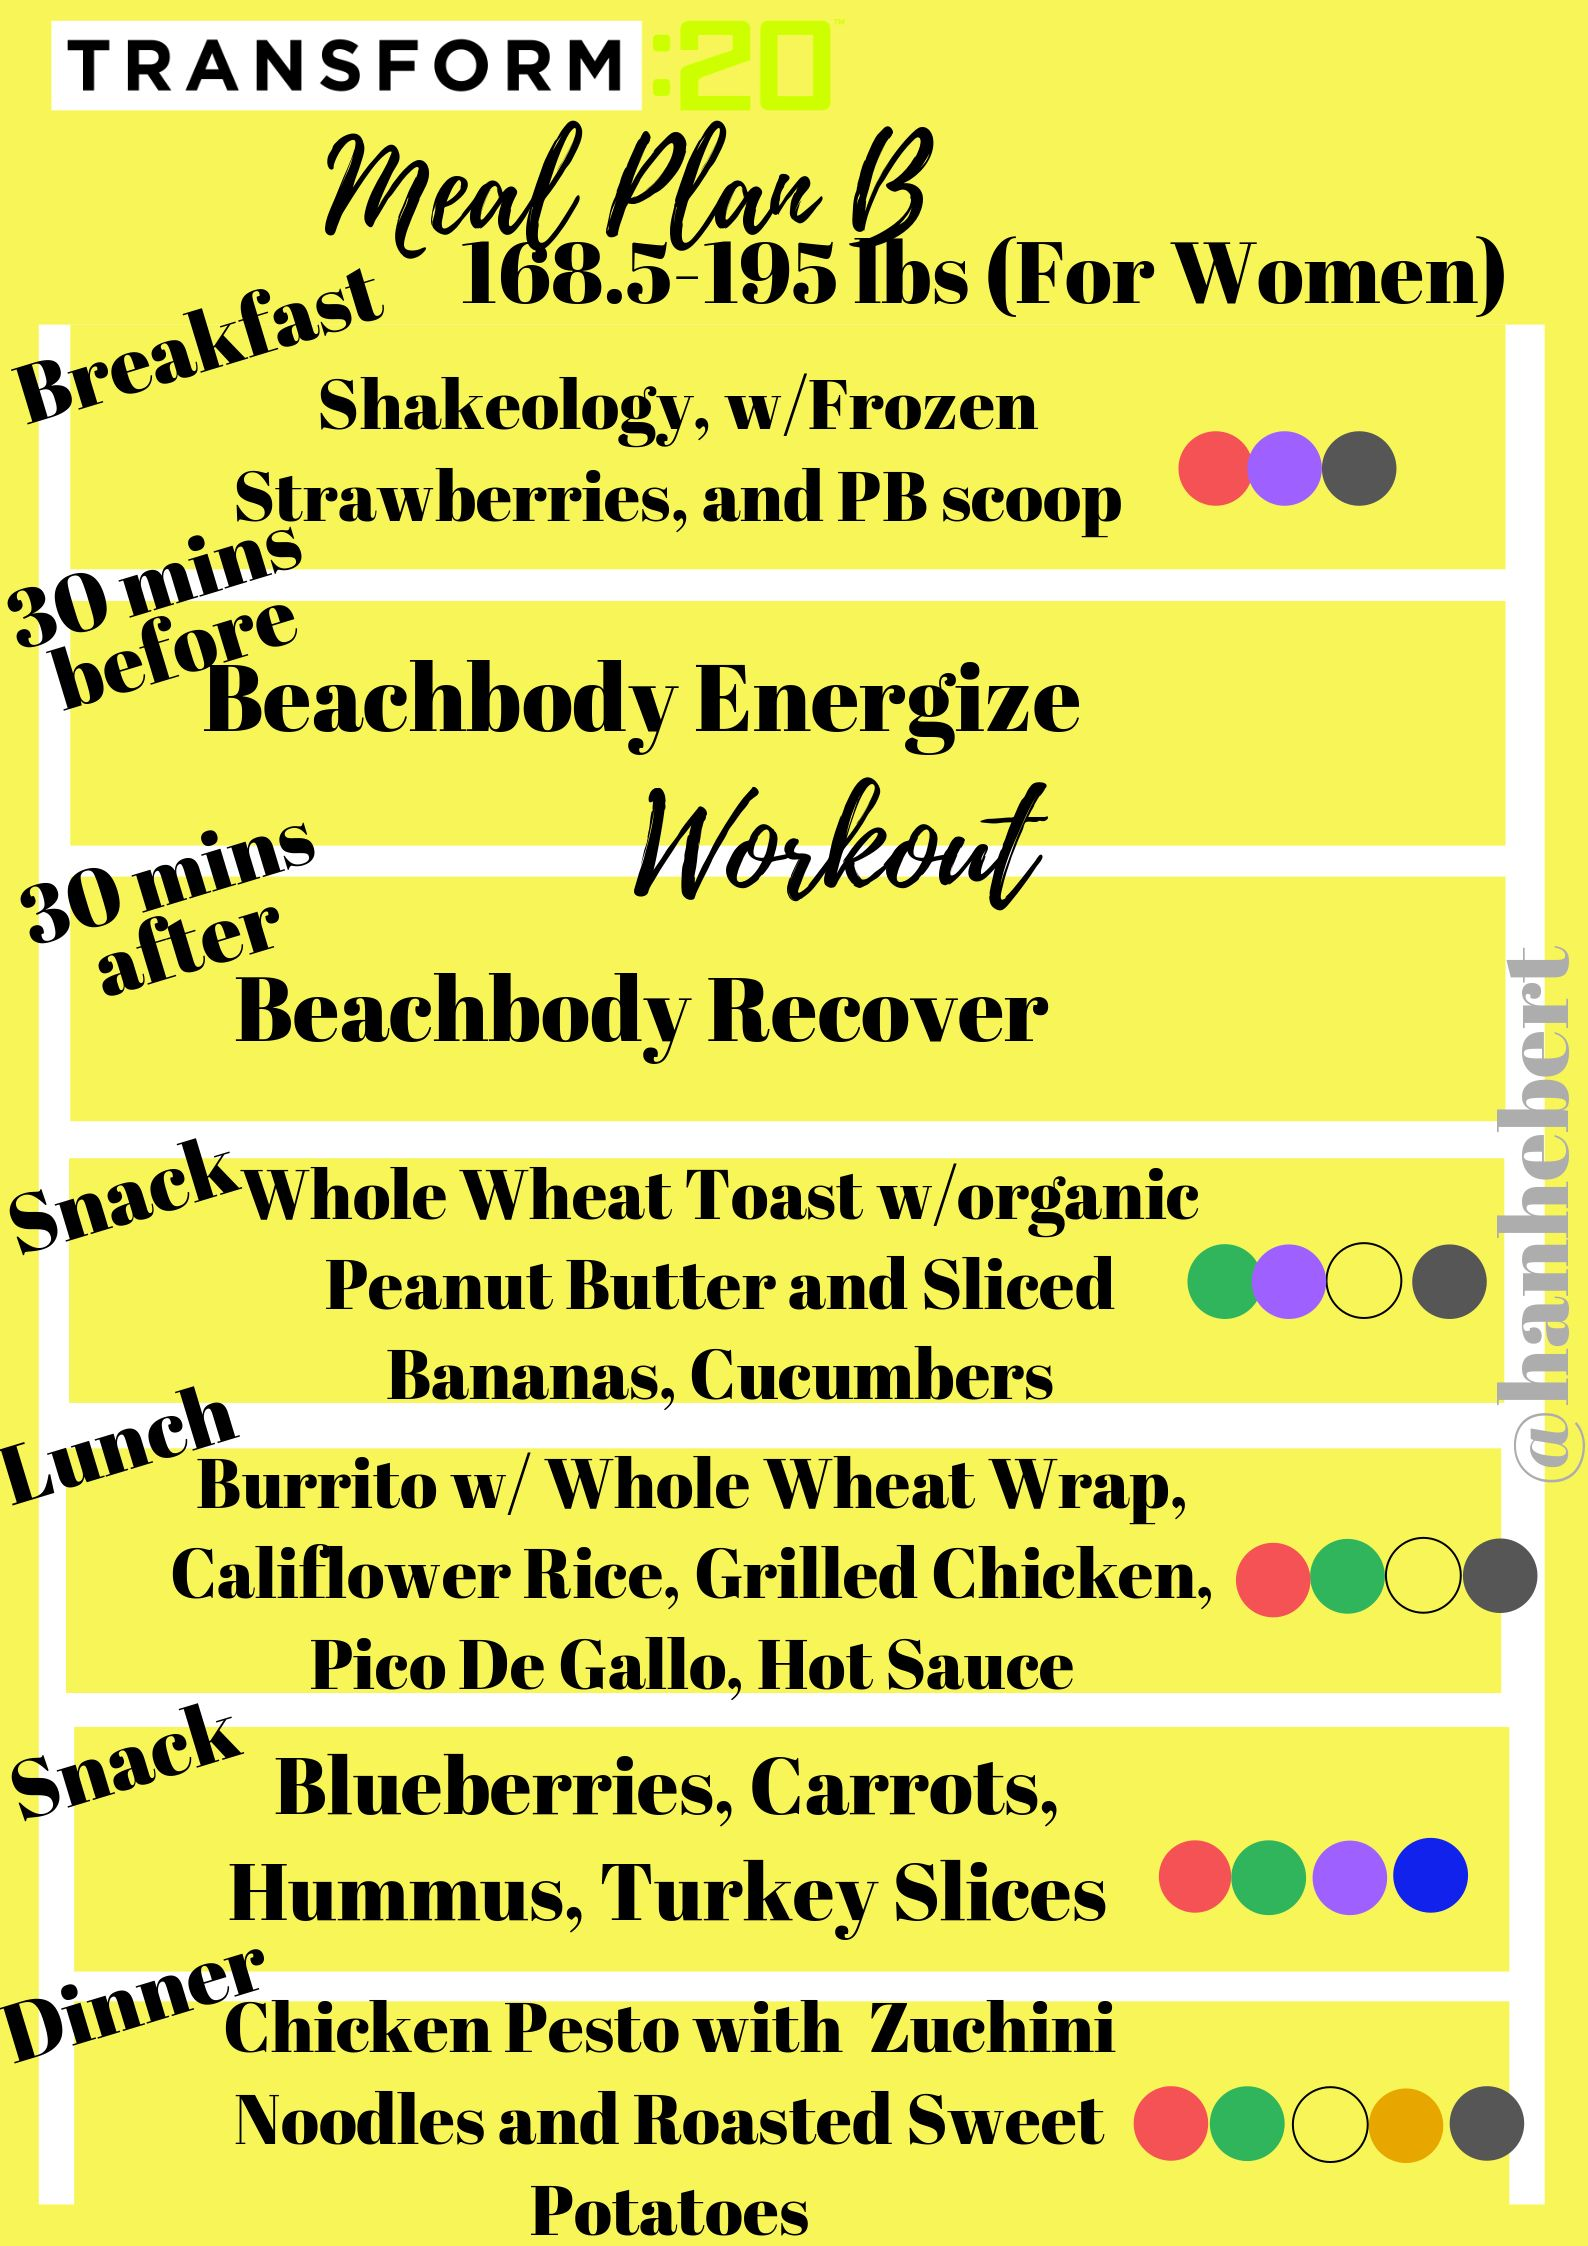 Transform: 20 Meal Plan B for women 168 5-195 lbs  instagram